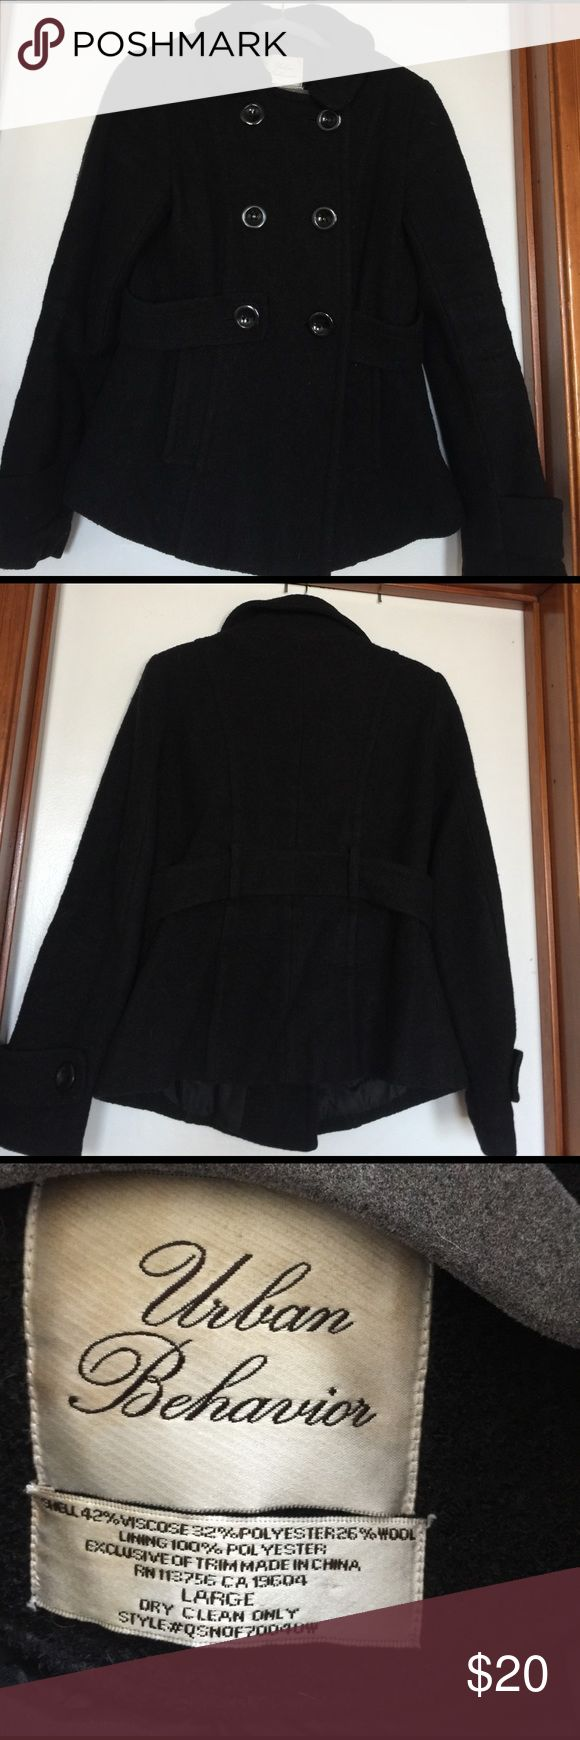 Black pea coat very warm Urban Behavior black pea coat urban Behavior Jackets & Coats Pea Coats